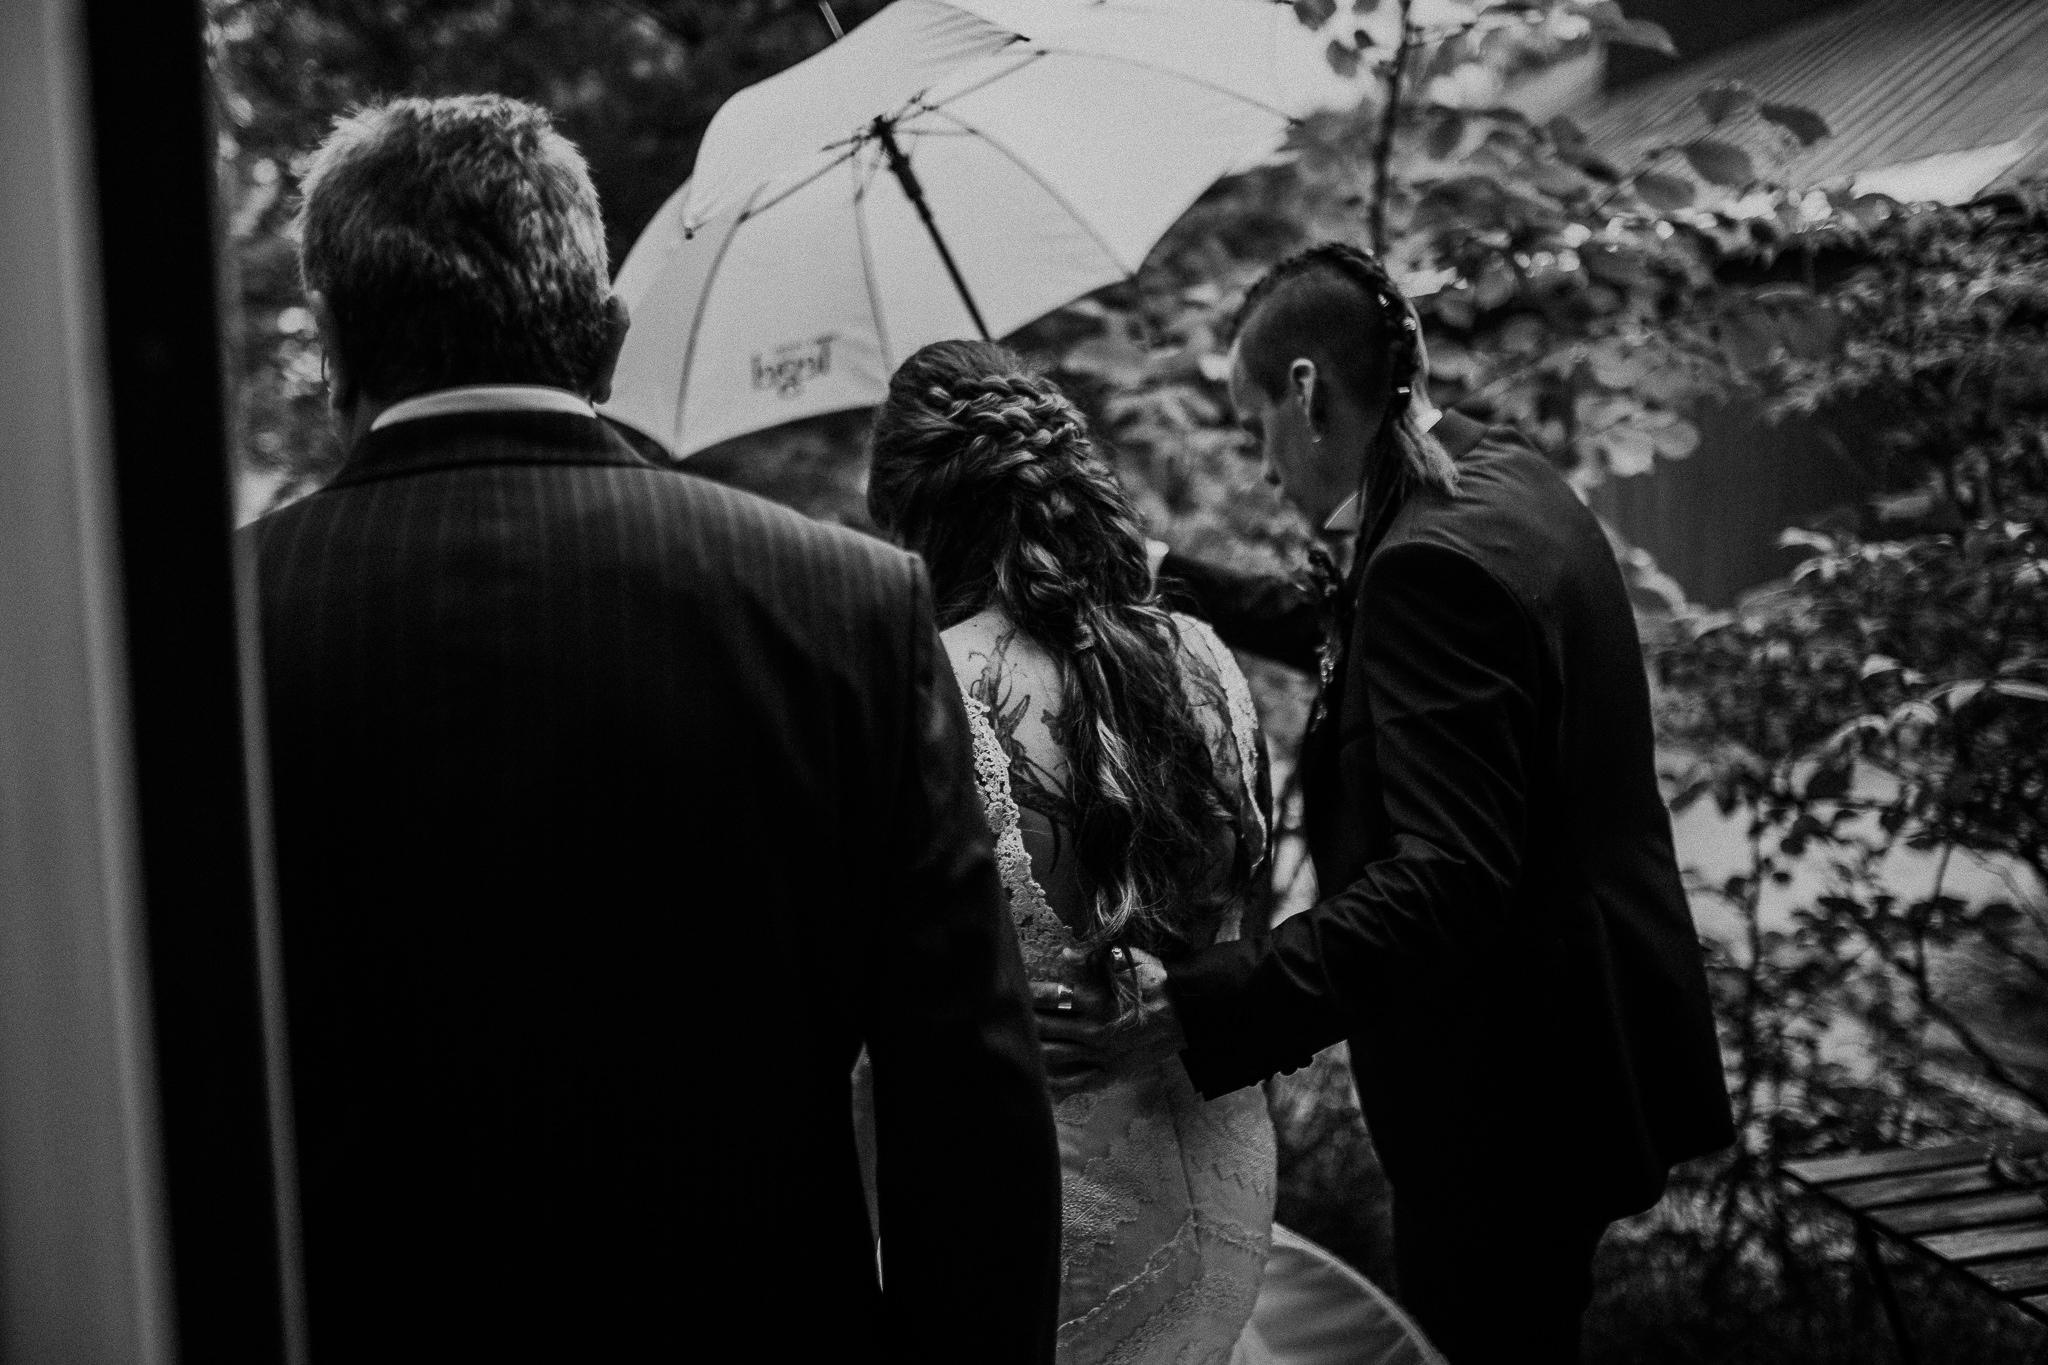 Ceren & Jani - Finland Wedding Photographer - Weddings by Qay - Wedding Photographer (89 of 166).jpg